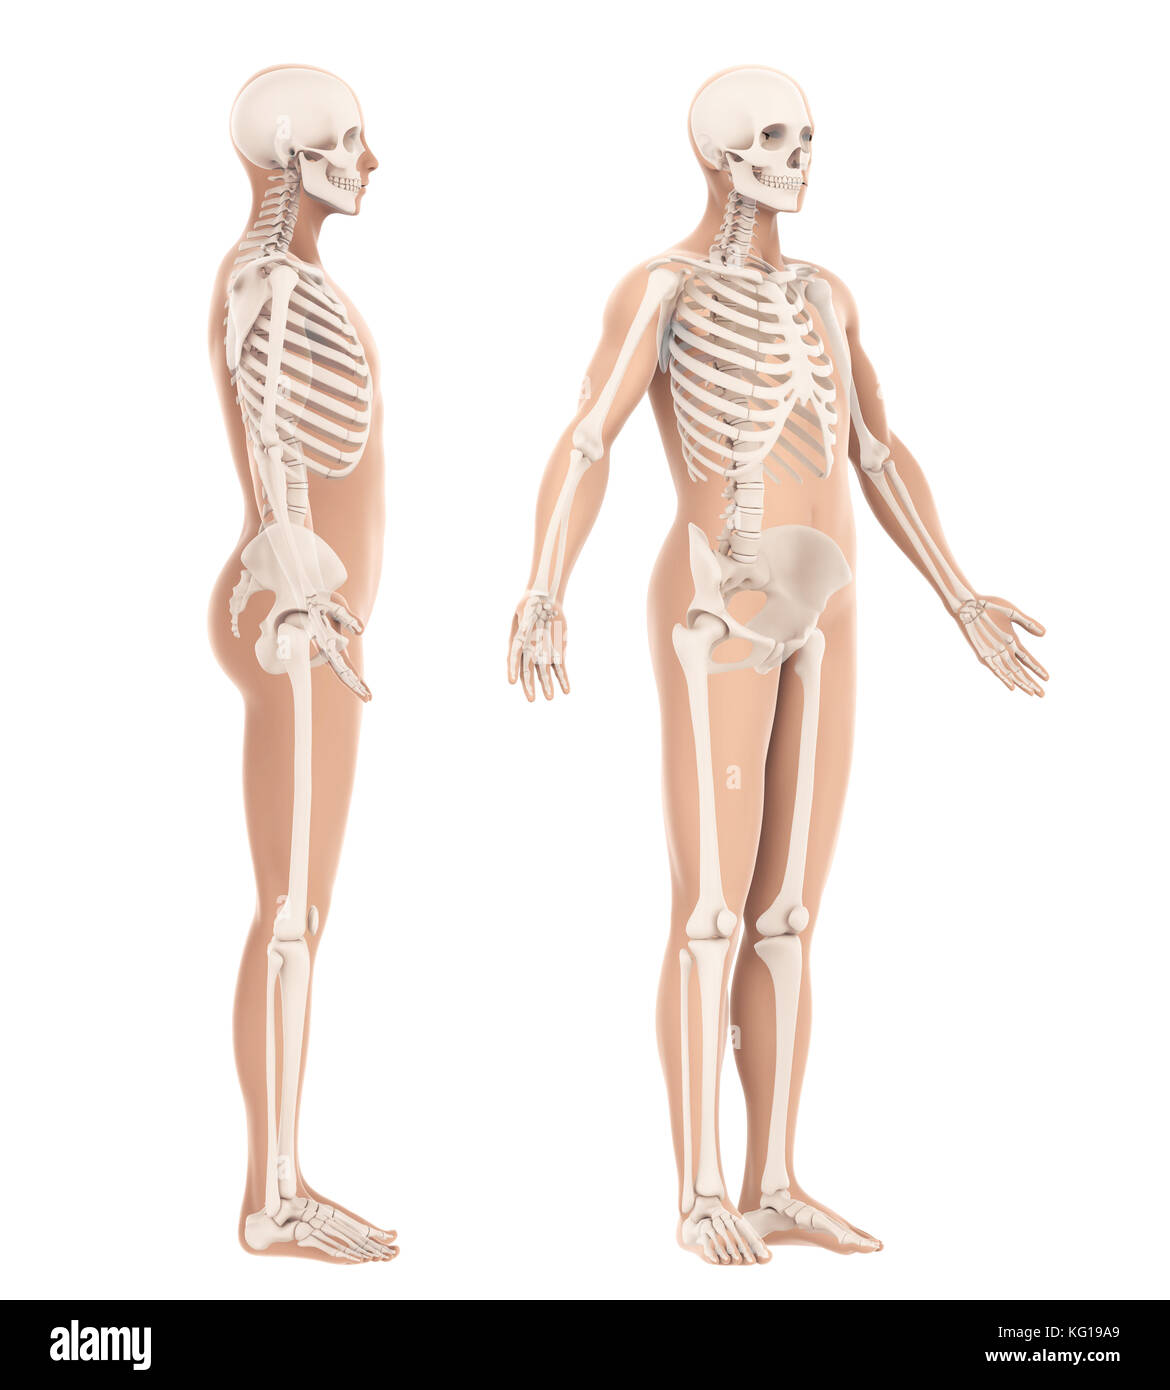 Human Skeleton Anatomy Stock Photo: 164757105 - Alamy